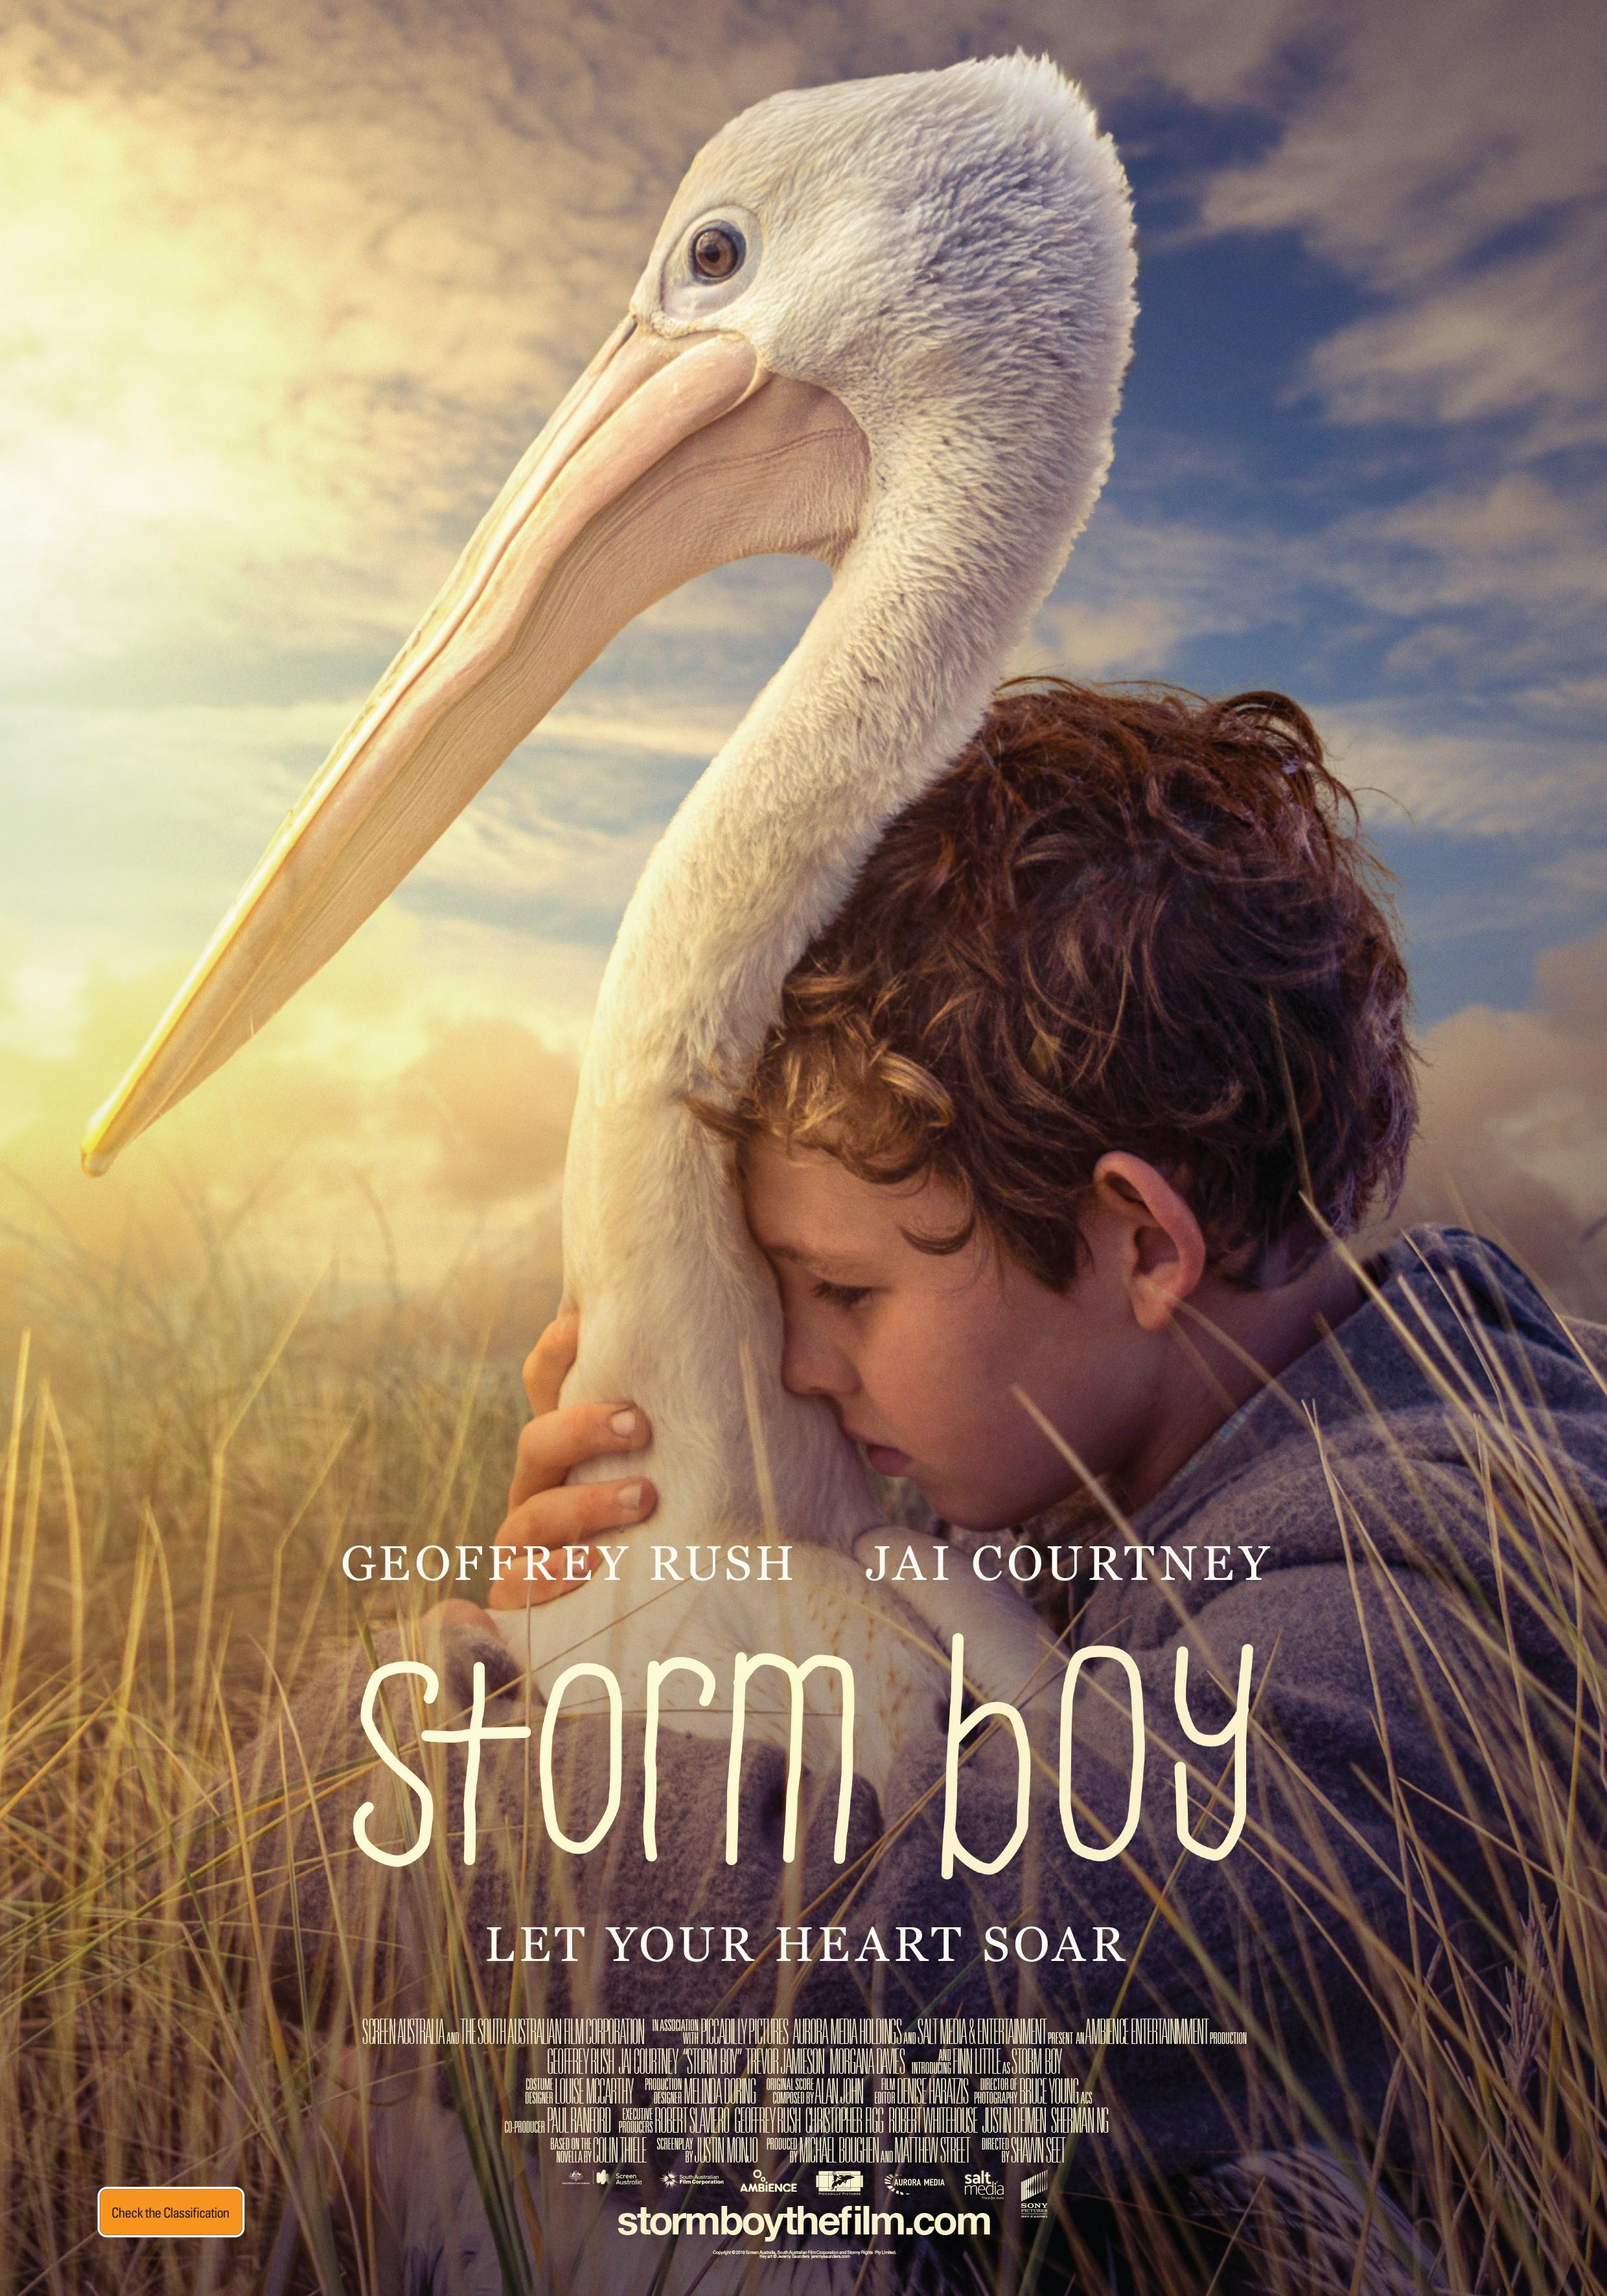 Boy dating boy live movie 2019